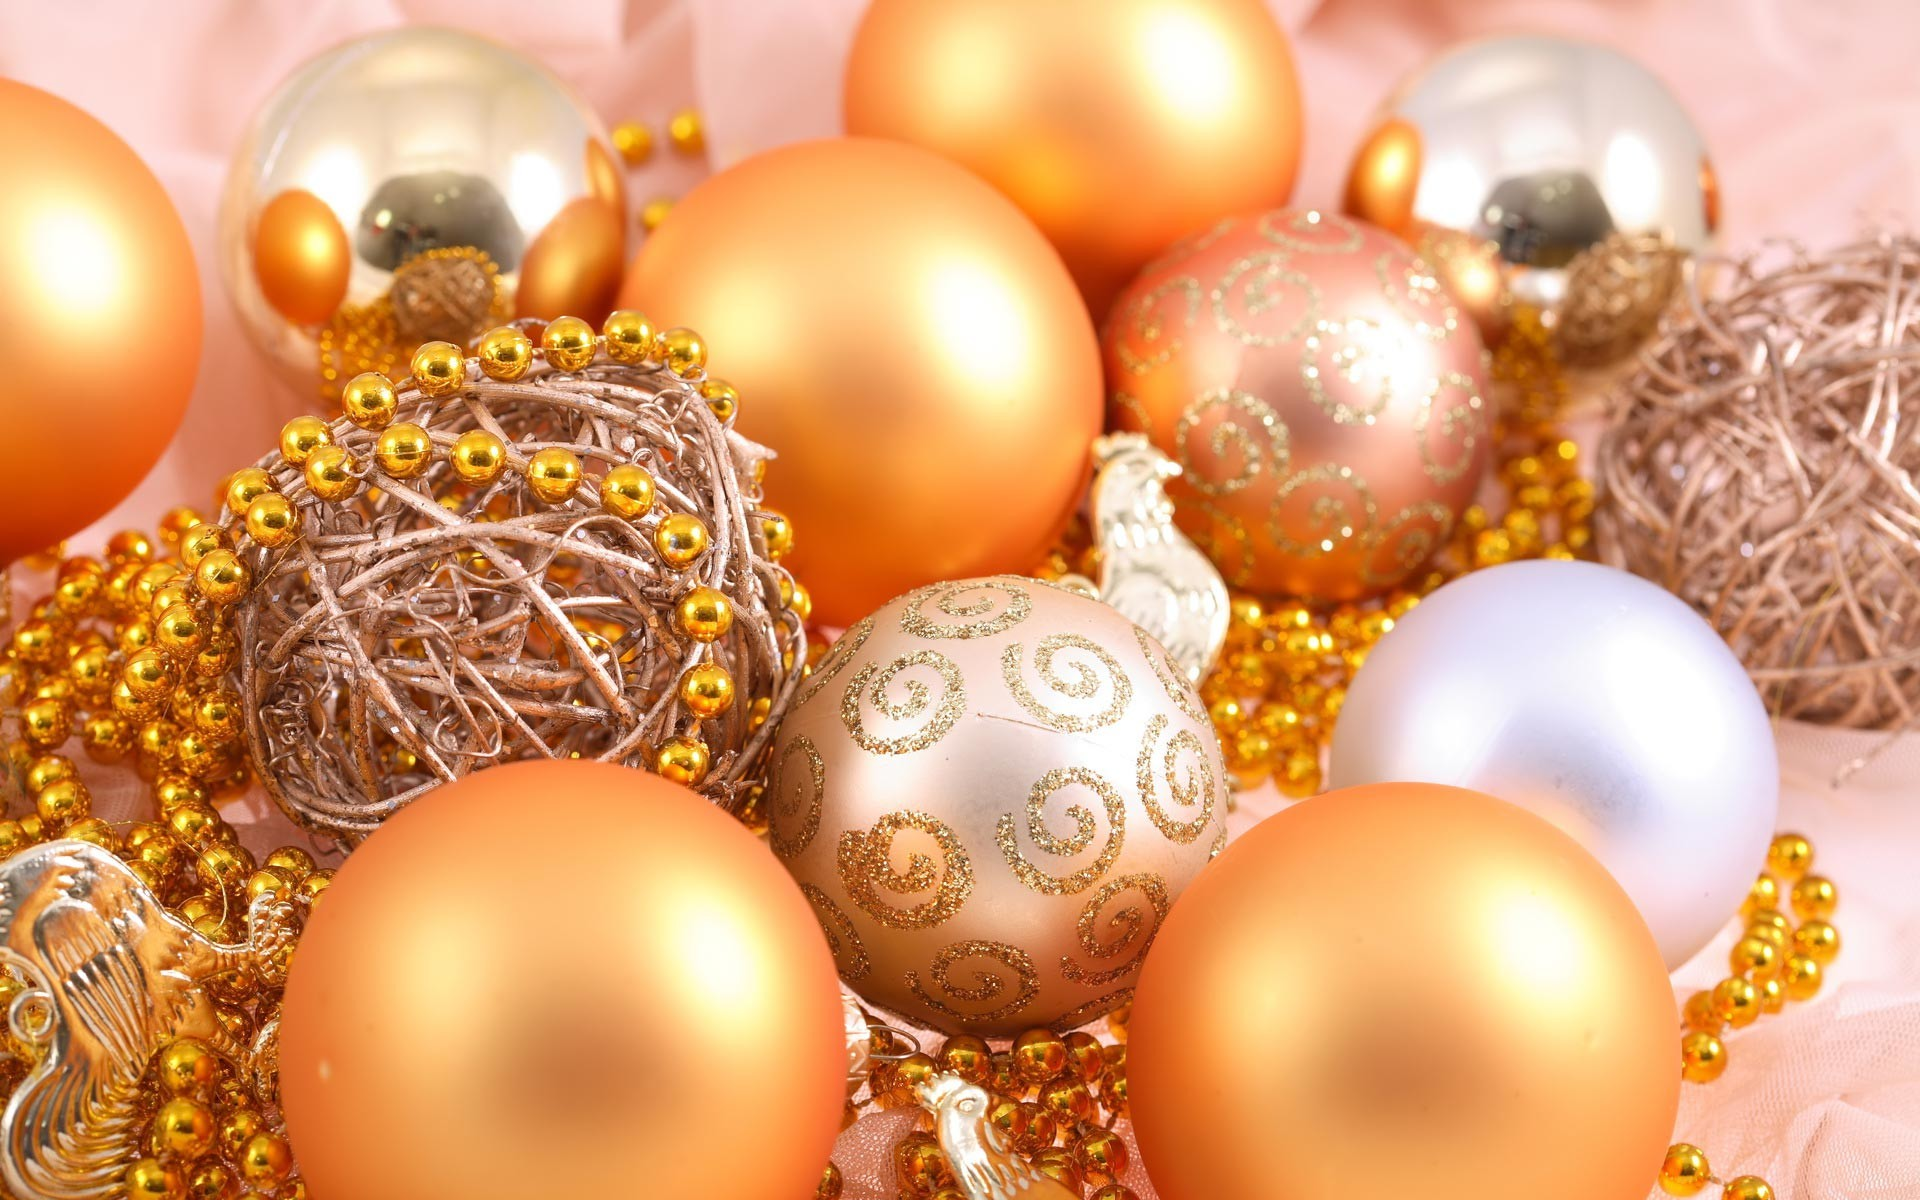 Christmas Themed Desktop Backgrounds (04)